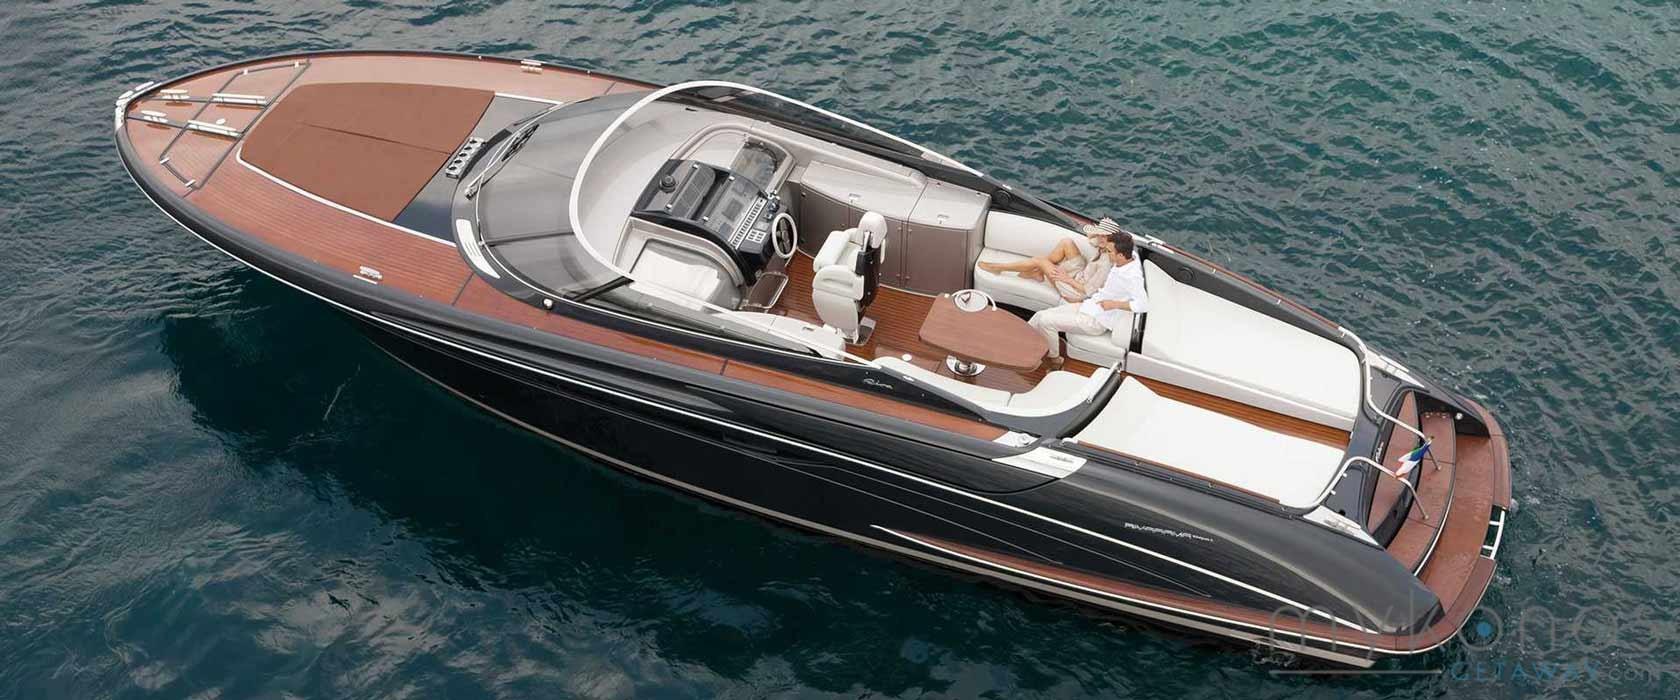 Luxury Speed Boat Rentals Mykonos Private Cruise